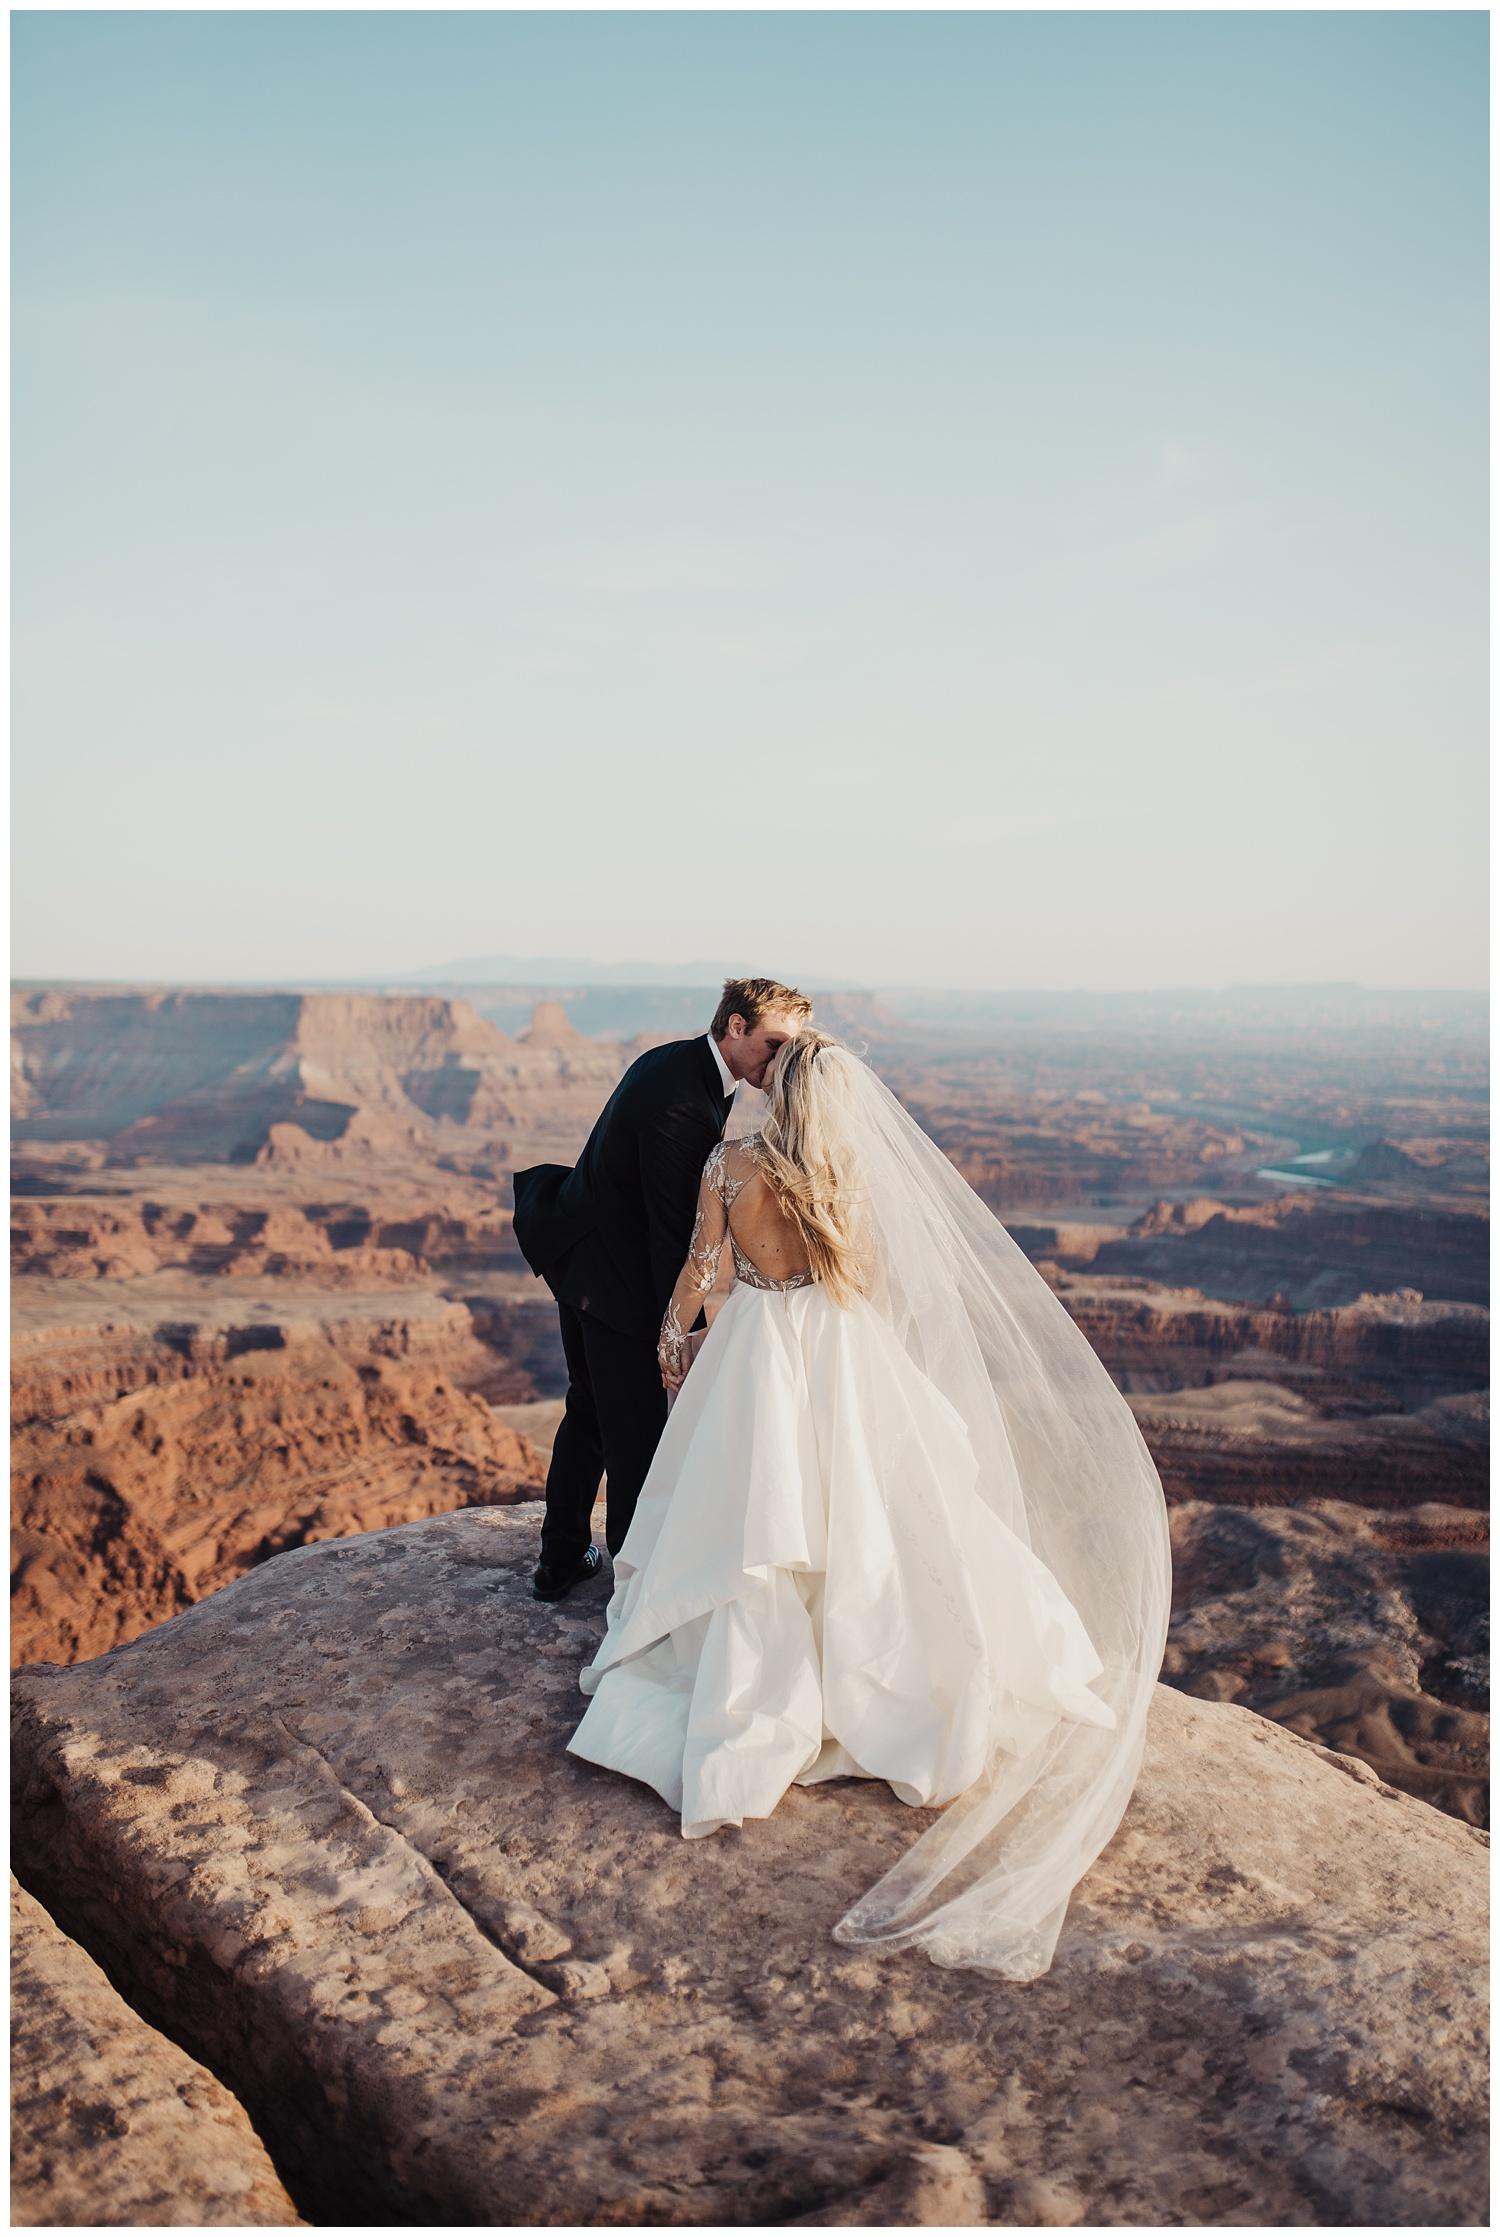 edenstraderphoto-weddingphotographer_0807.jpg